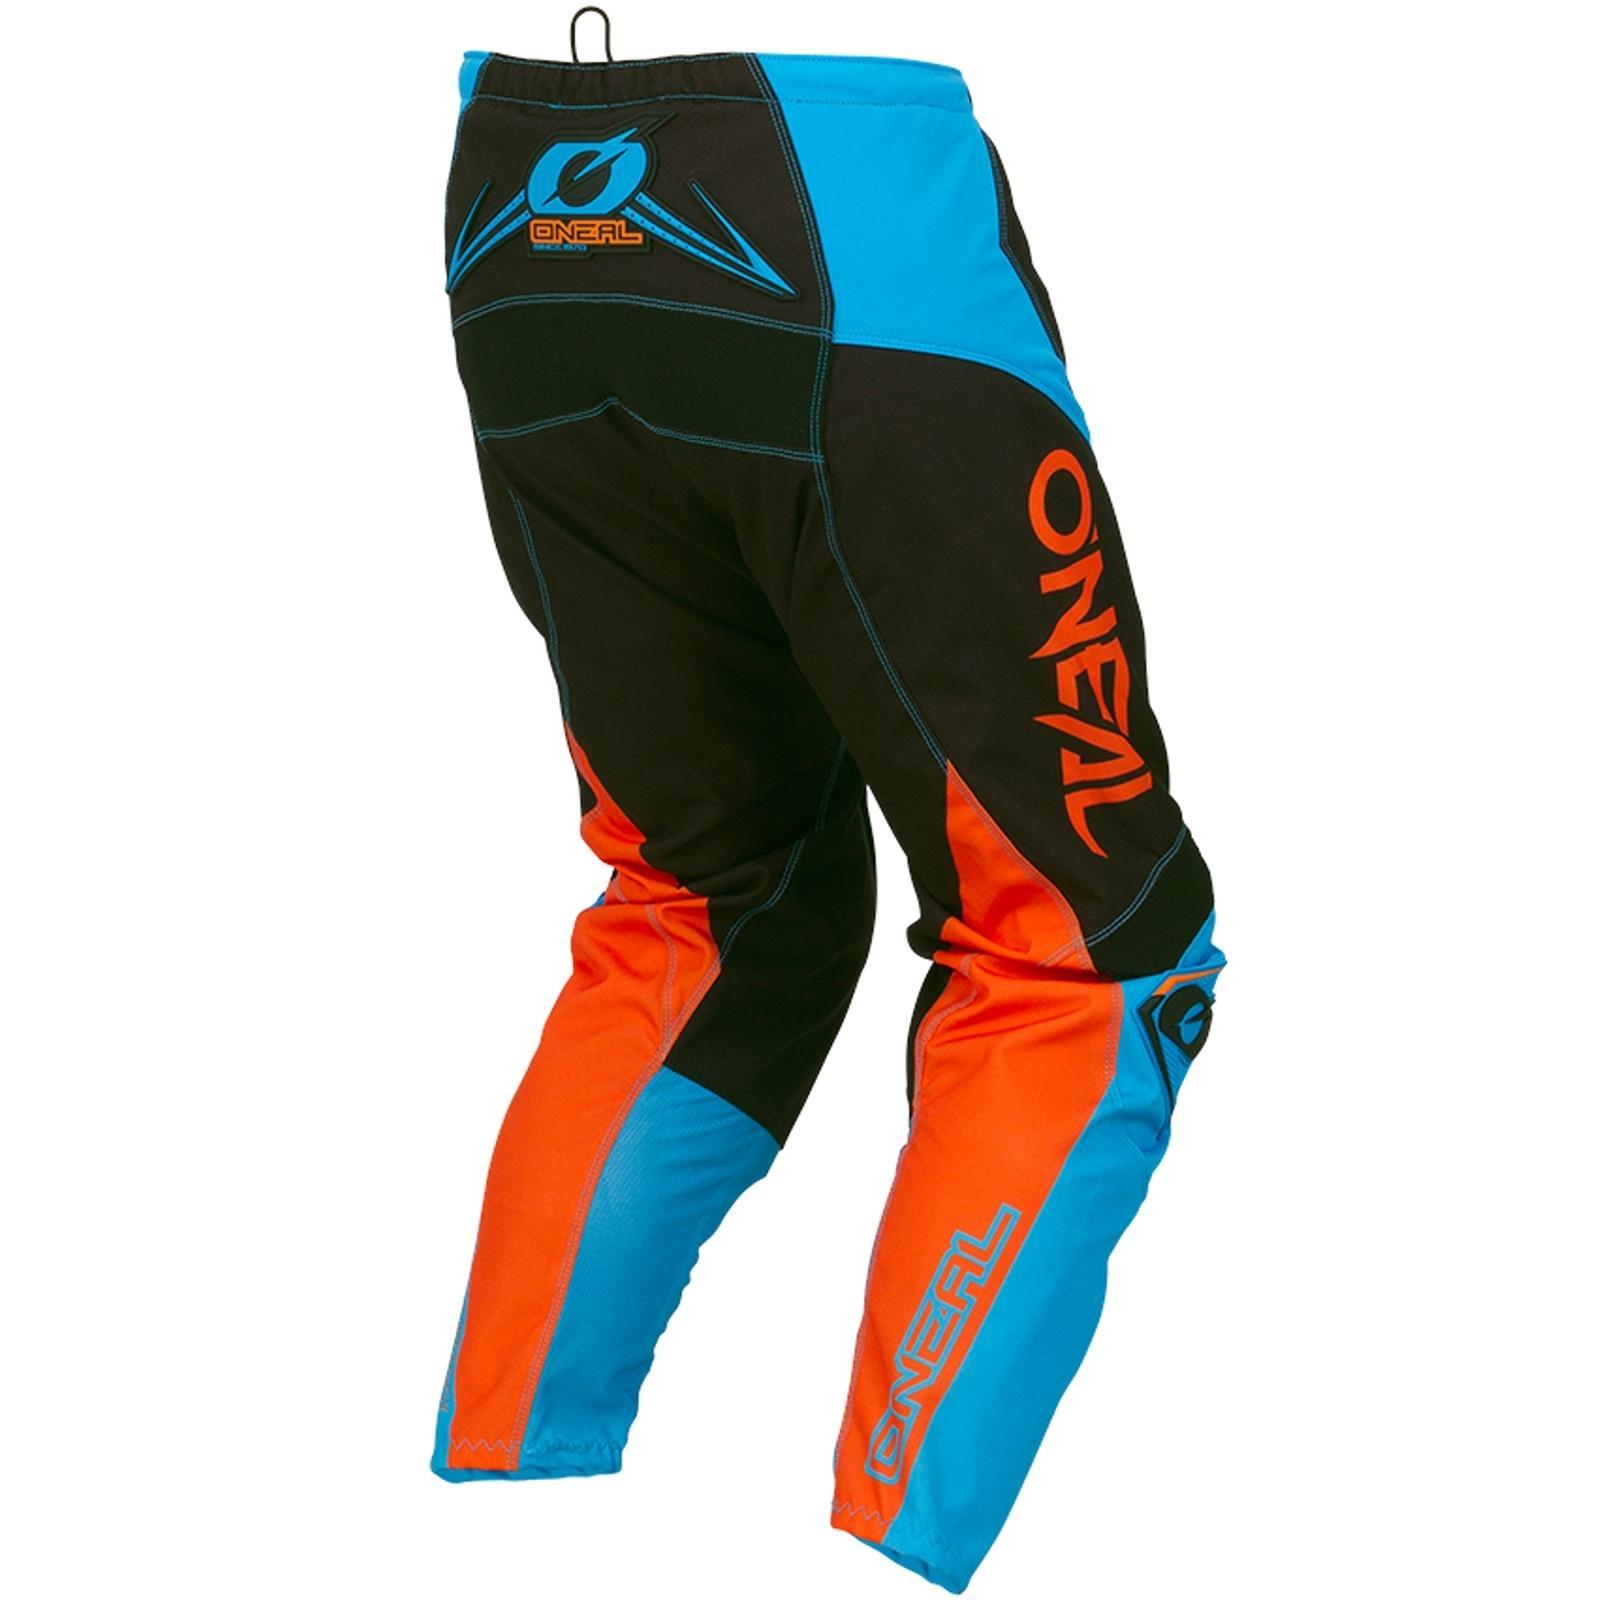 Oneal-elemento-Mayhem-Hardwear-Pants-pantalones-MX-DH-FR-Moto-Cross-Enduro-MTB-moto miniatura 45